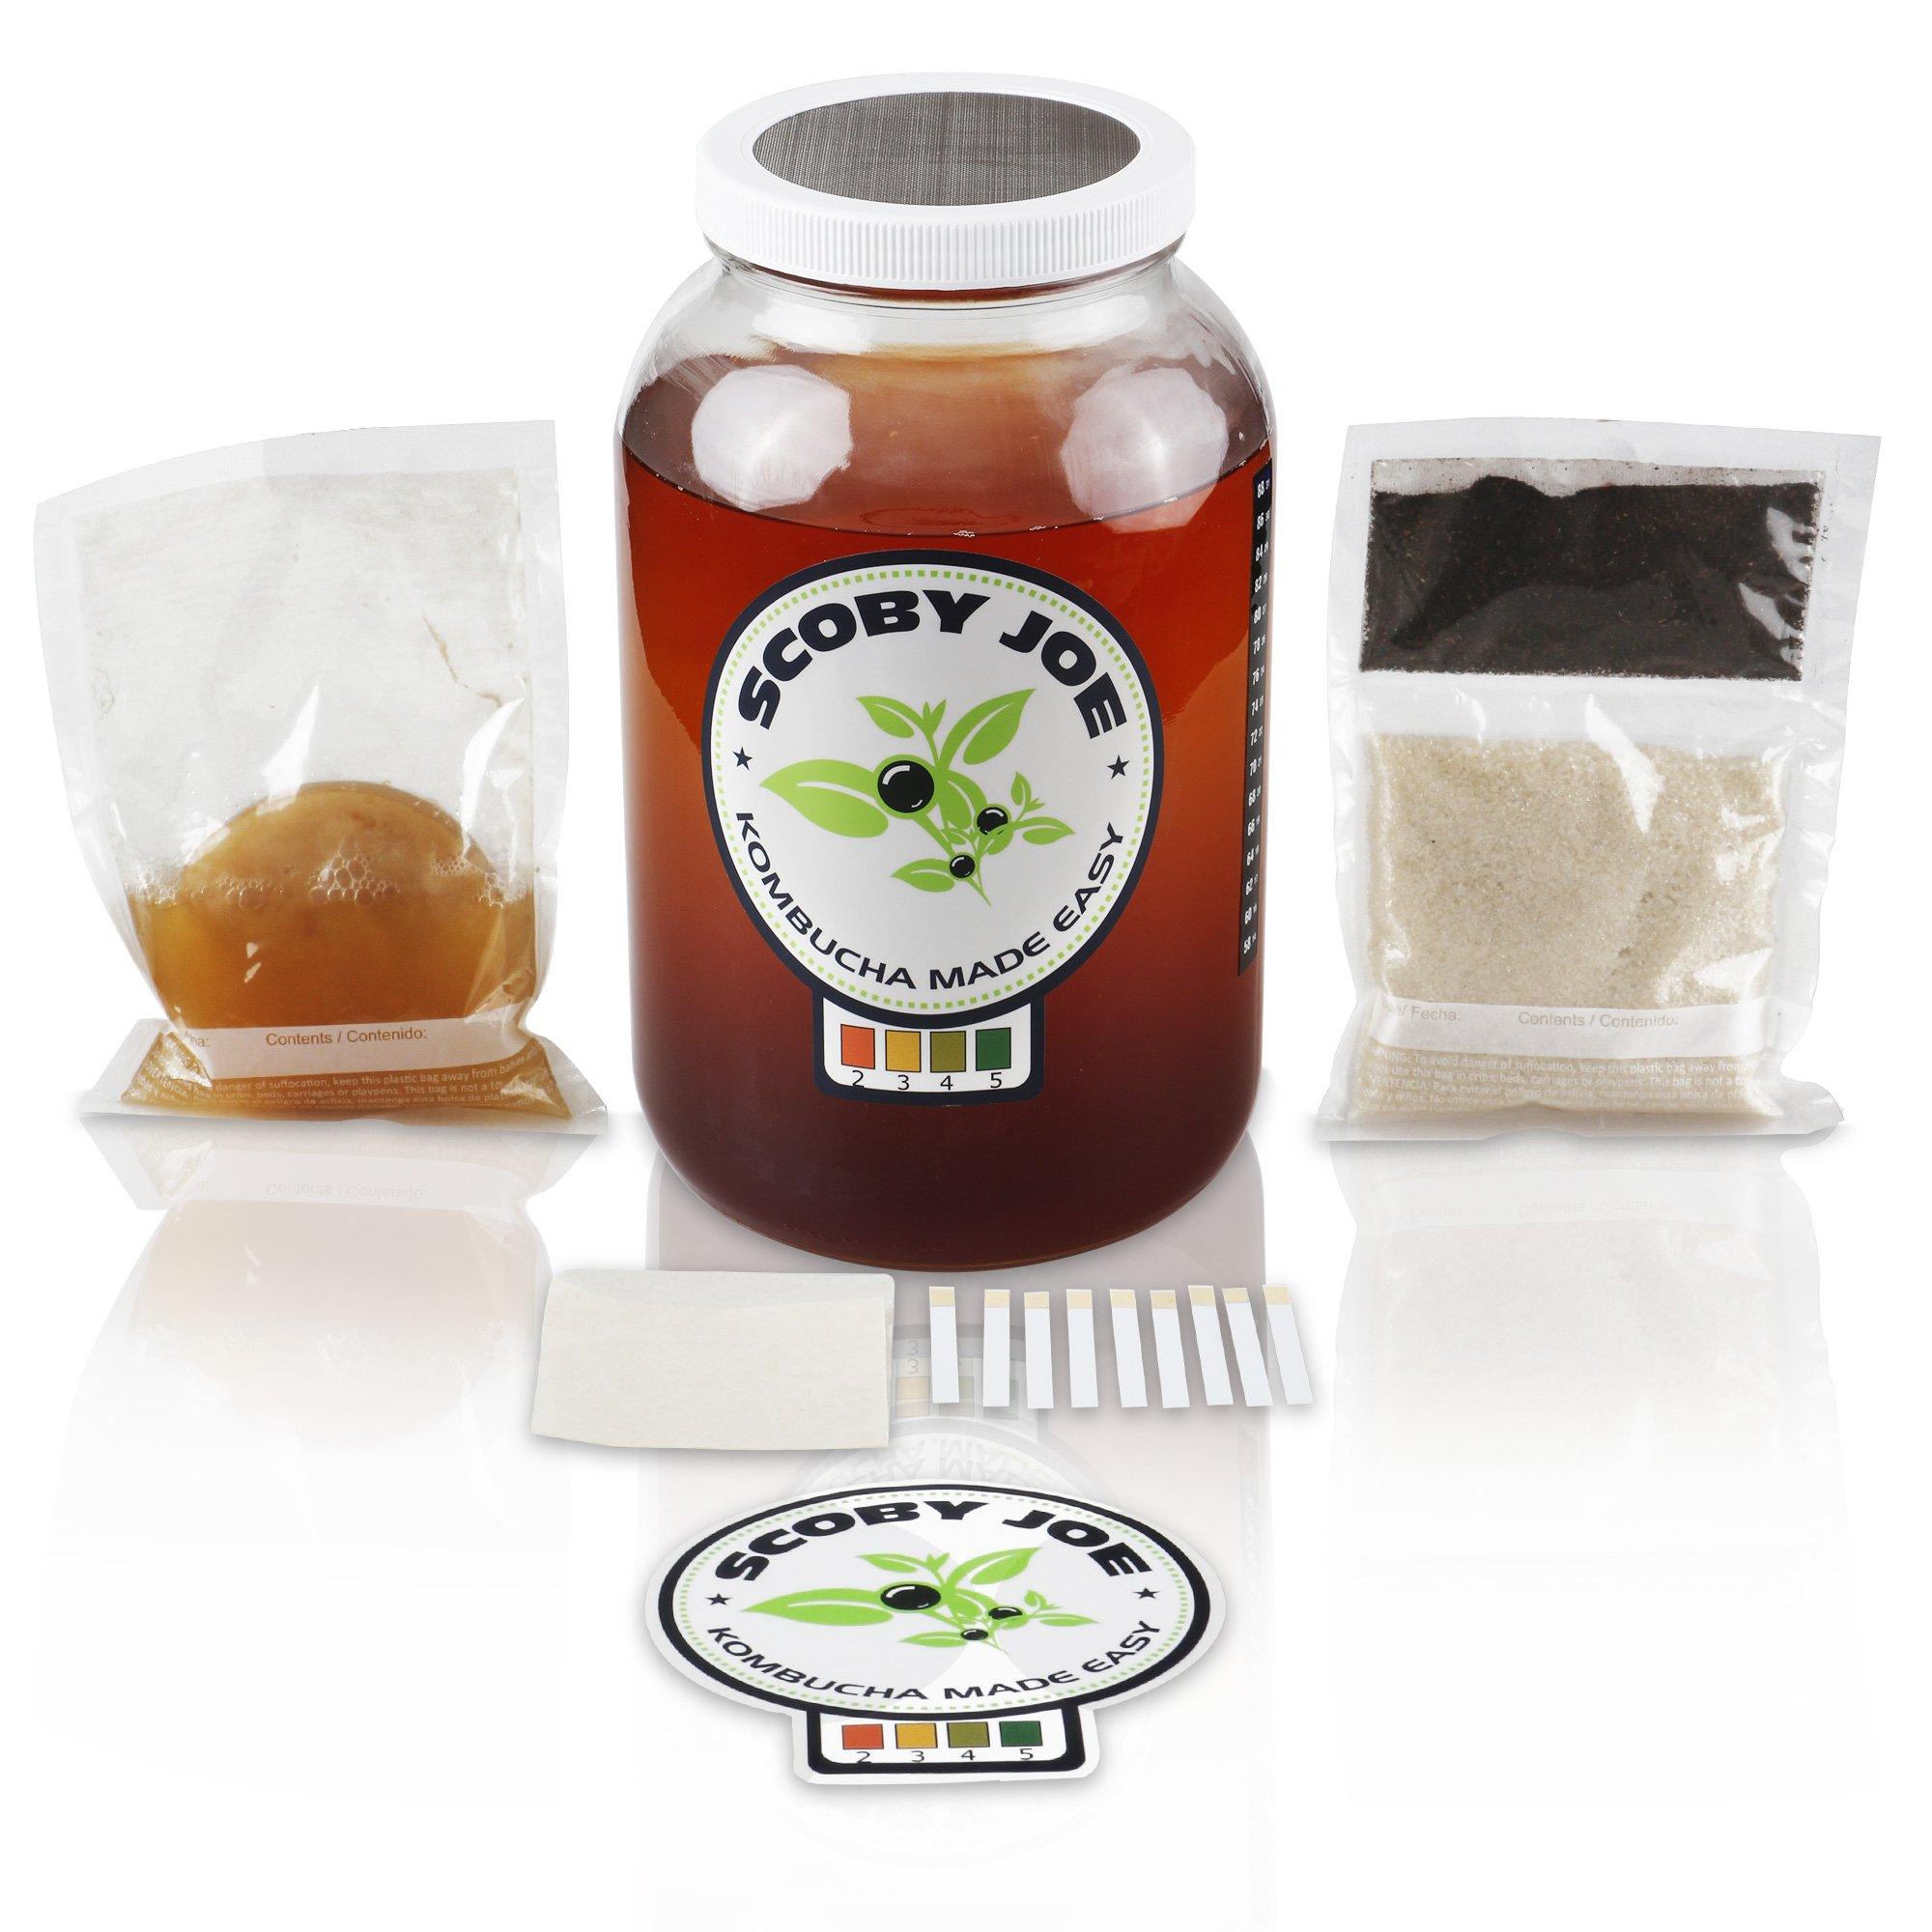 Kombucha Made Easy - All Organic Ingredients - SCOBY Joe - Home Brewing Kit